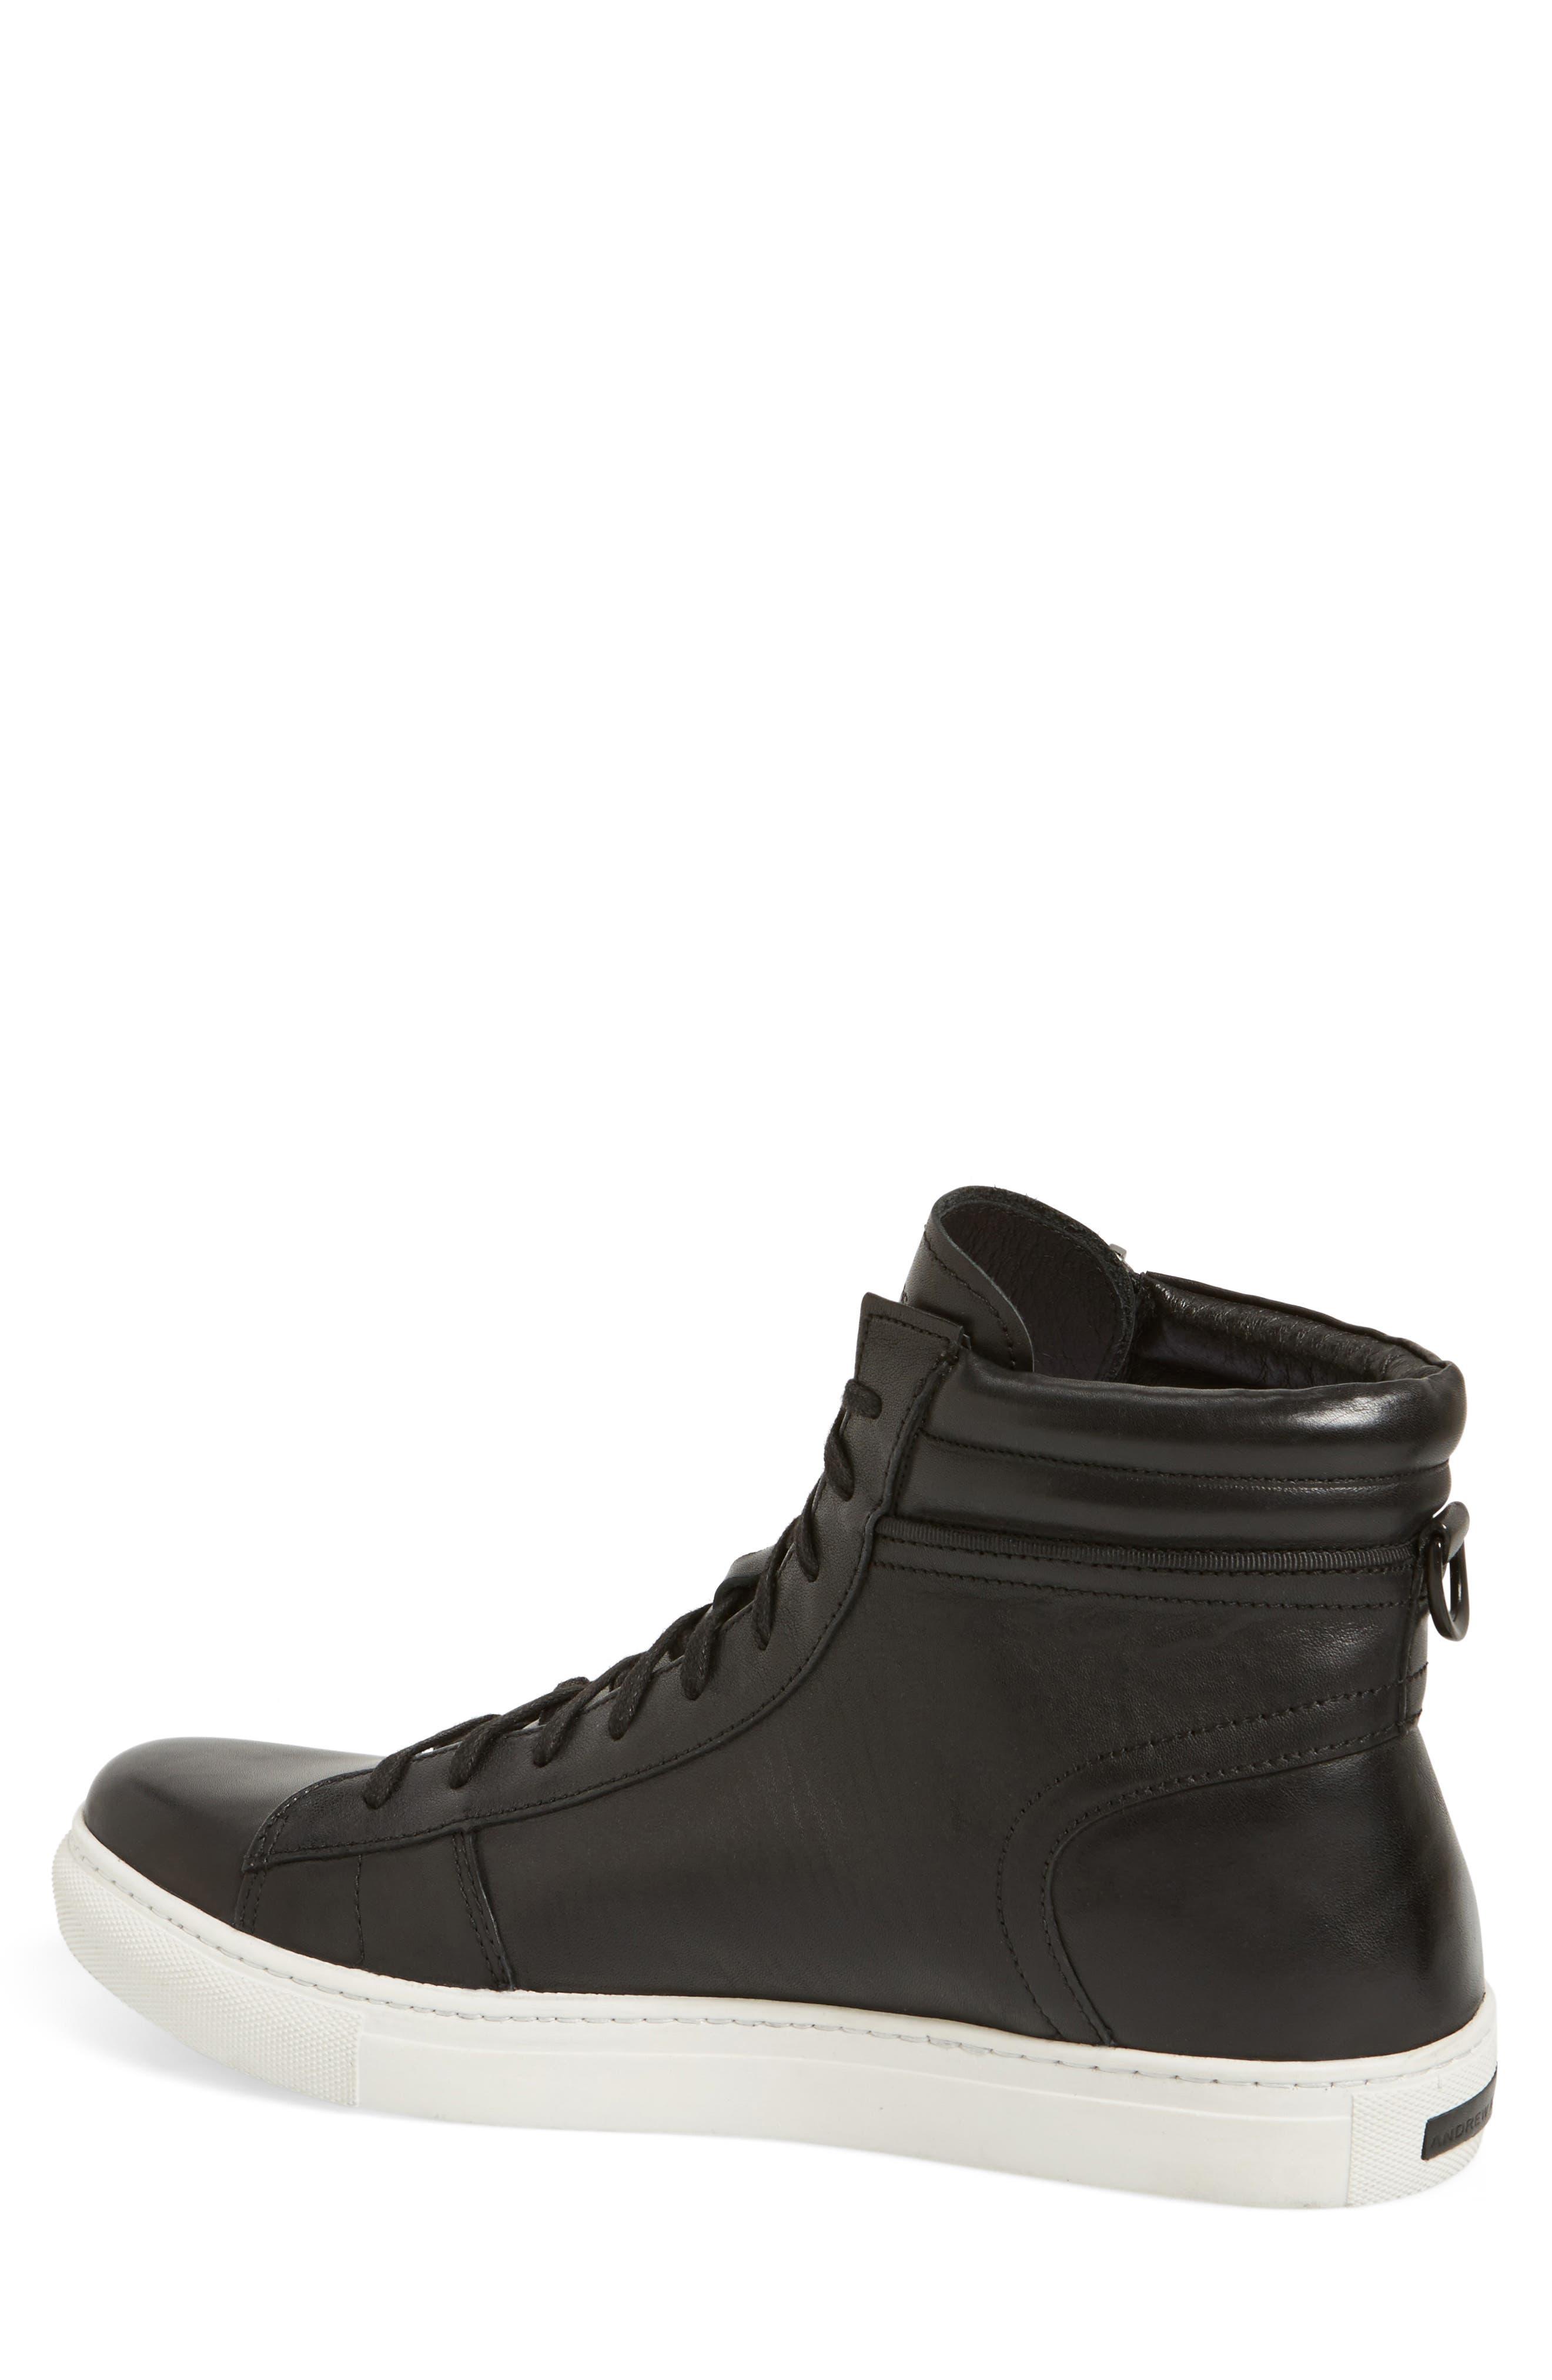 Remsen Sneaker,                             Alternate thumbnail 2, color,                             006